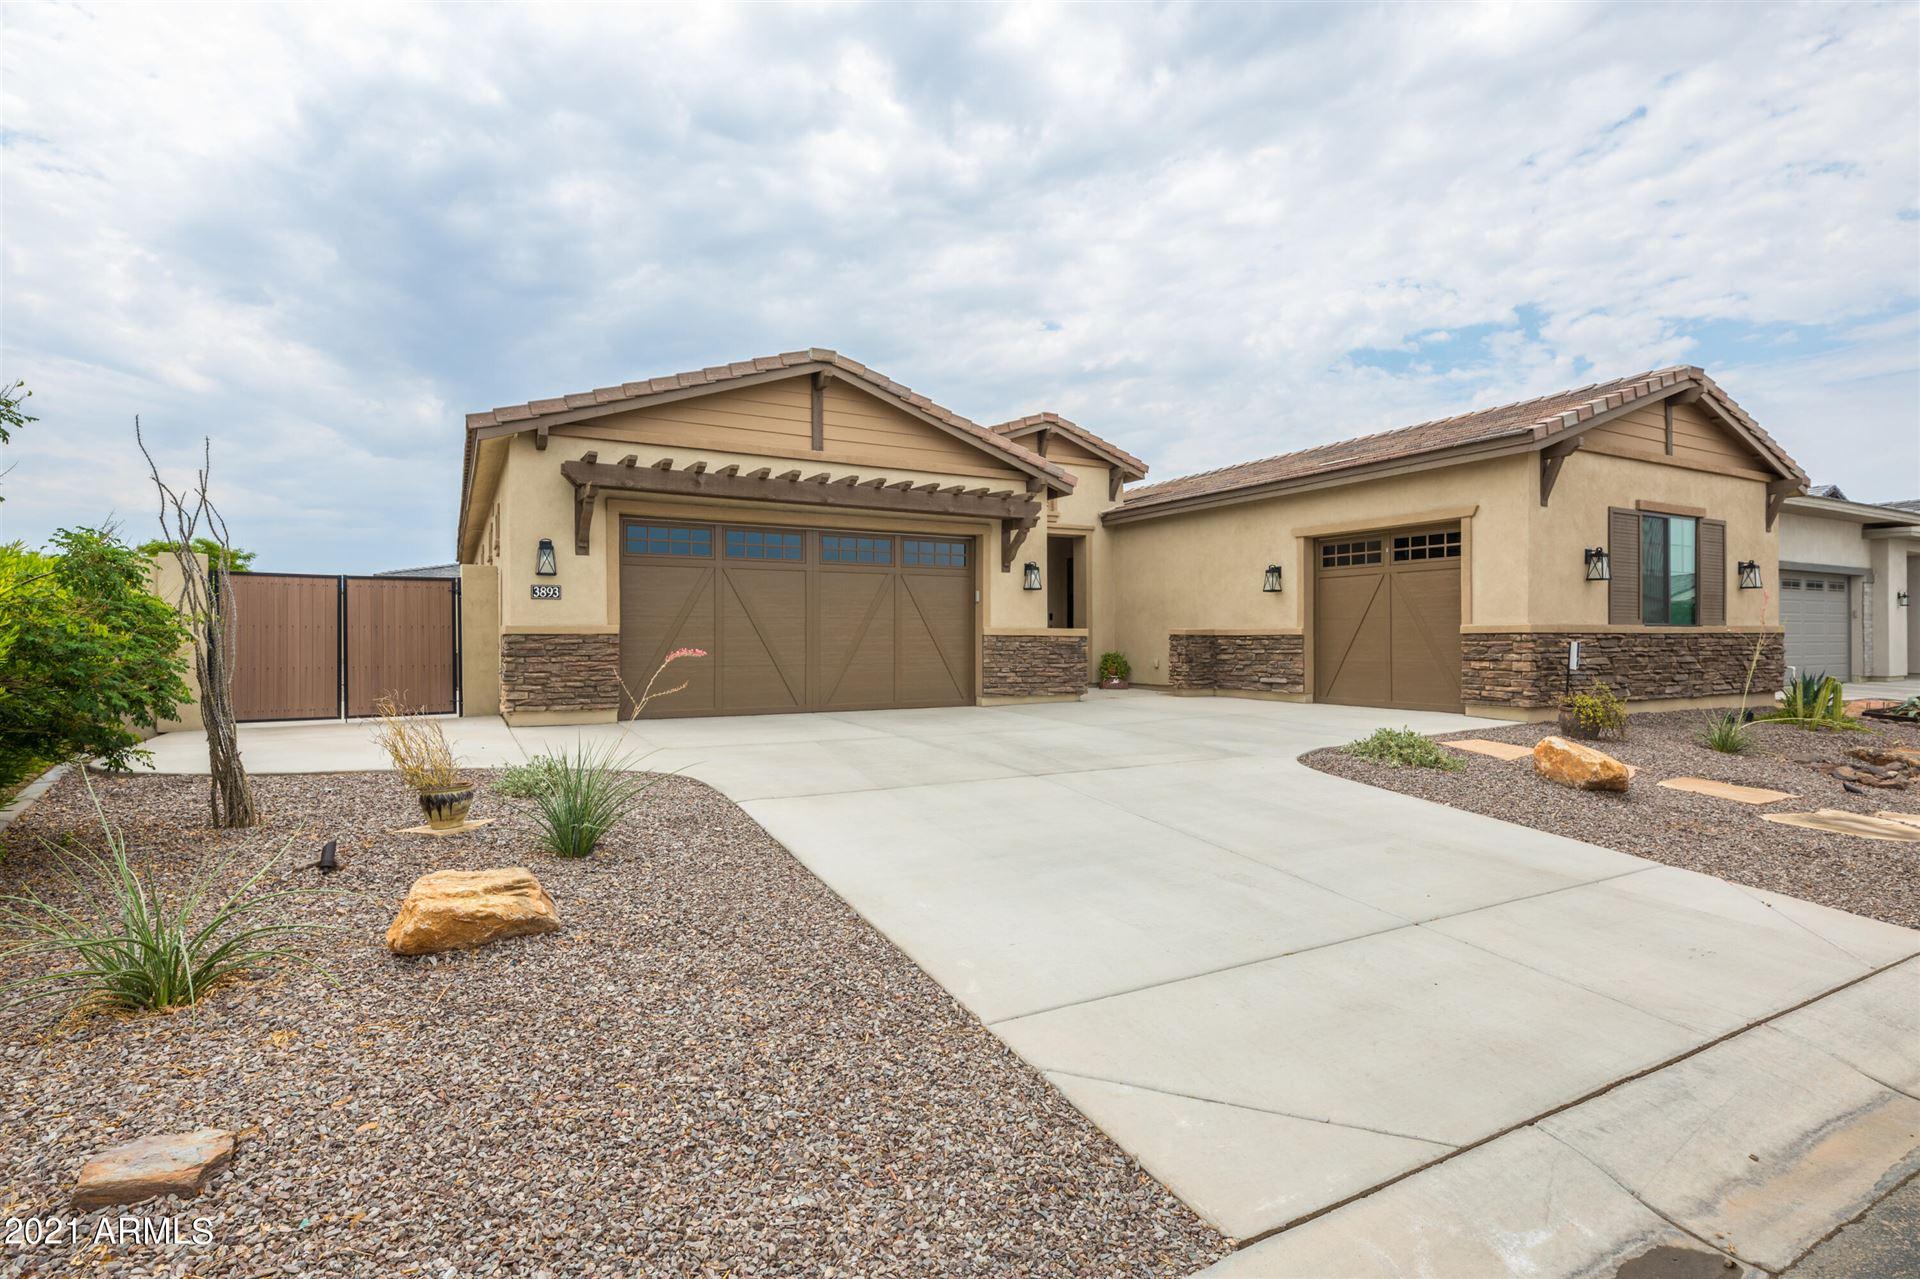 Photo of 3893 E ALAMEDA Lane, Gilbert, AZ 85298 (MLS # 6269043)